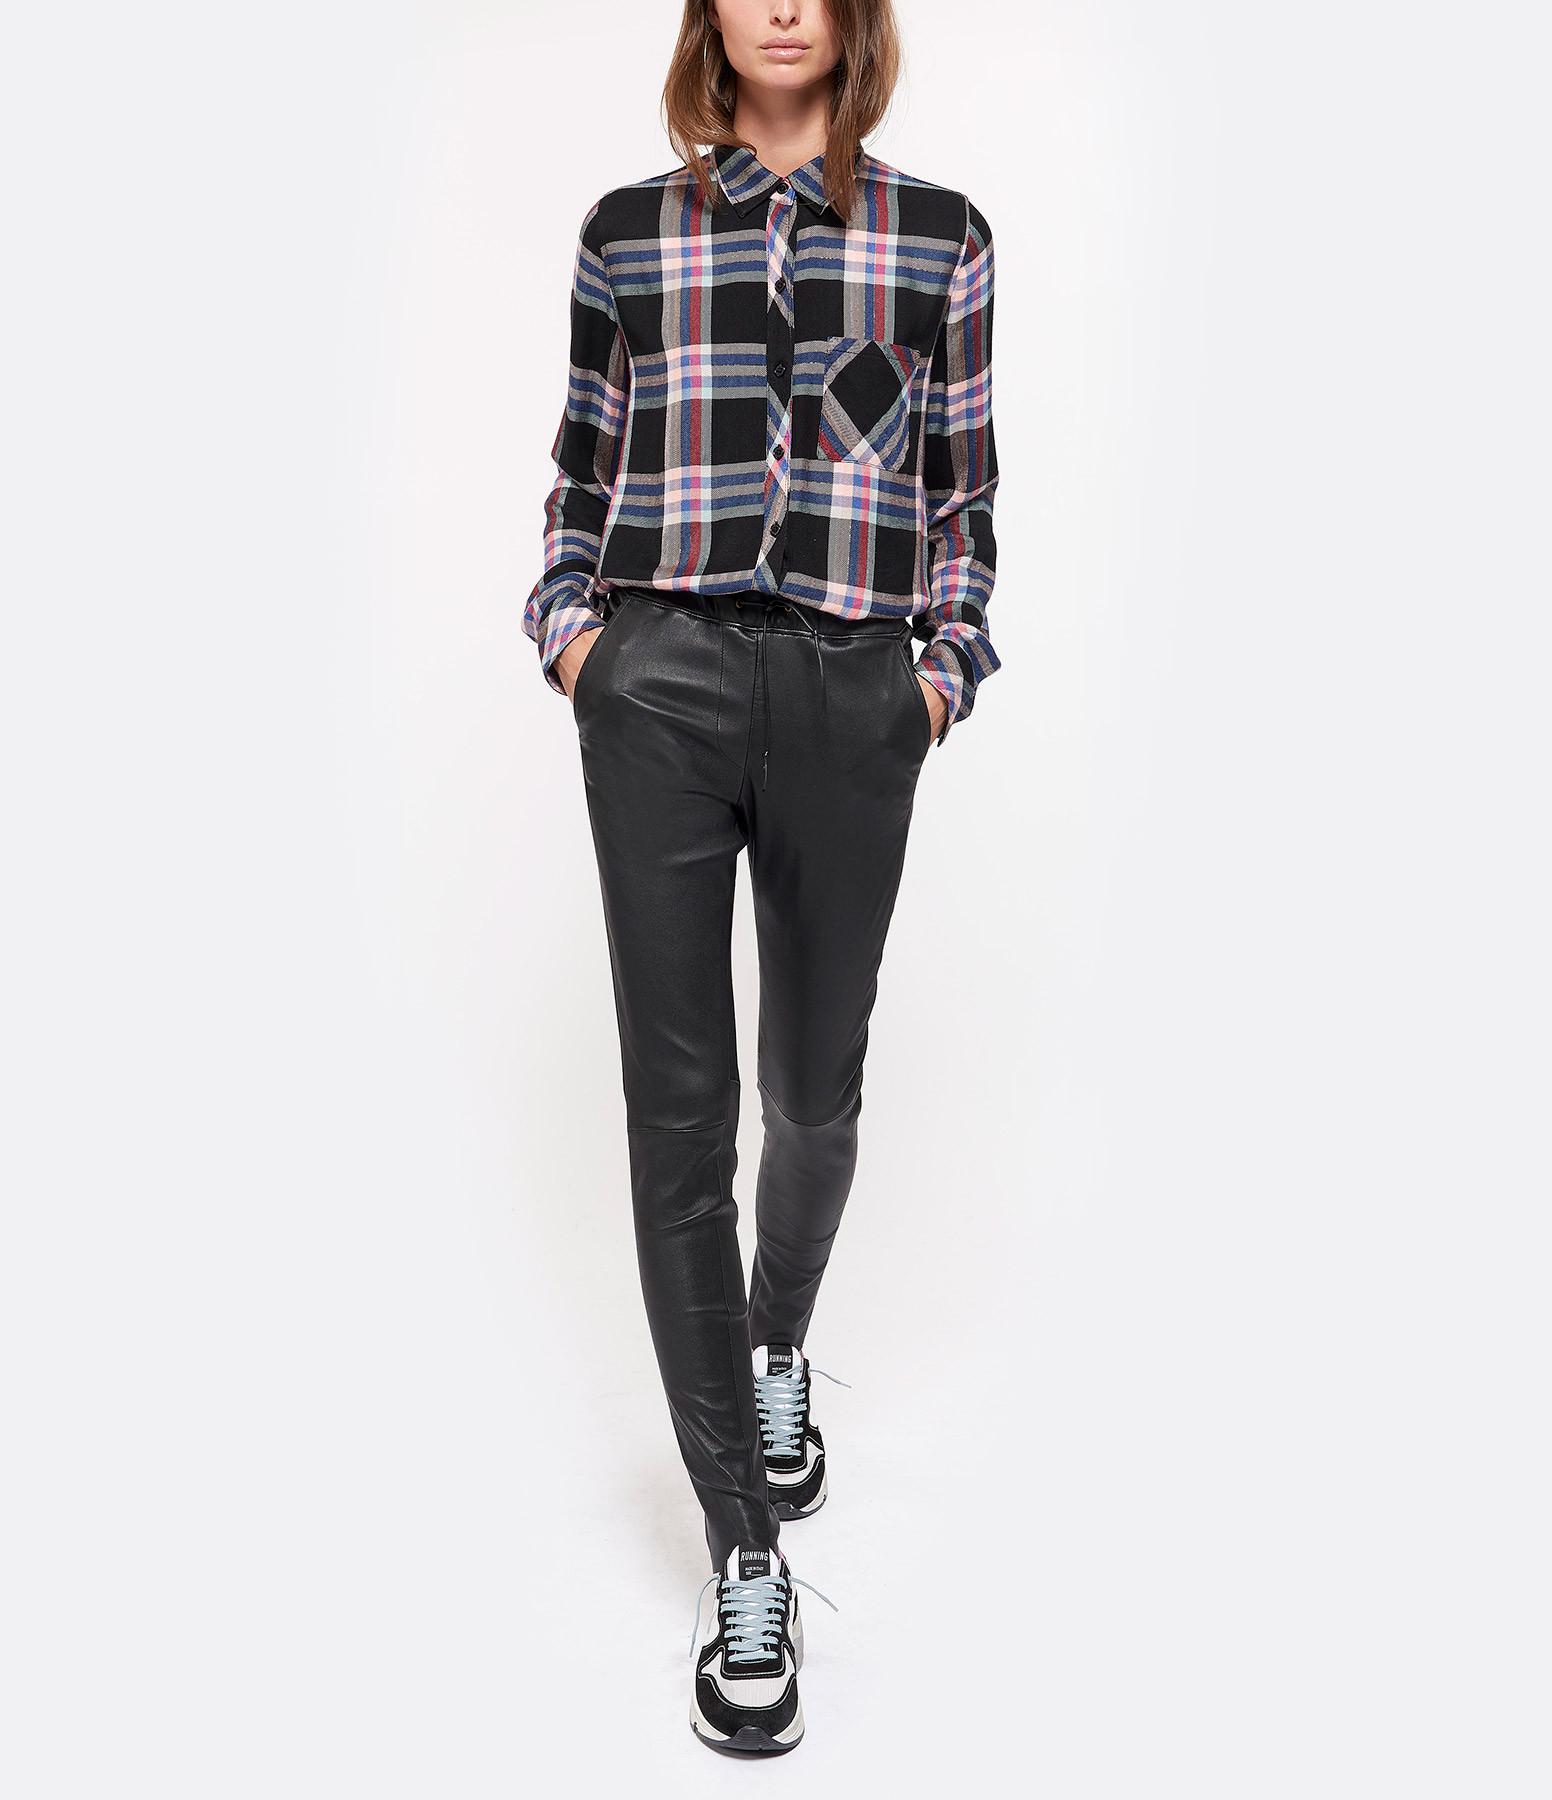 VENTCOUVERT - Pantalon Karen Cuir Agneau Stretch Noir